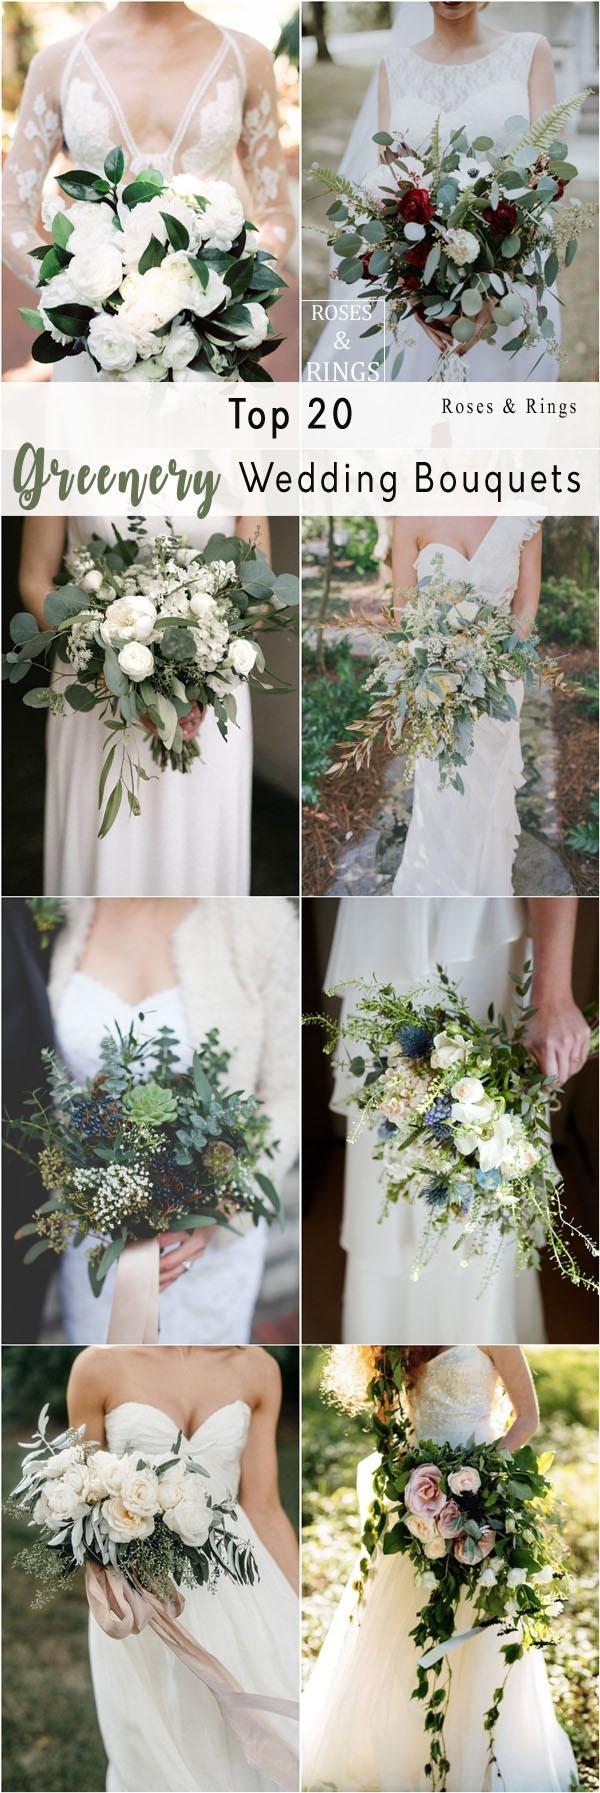 rustic greenery wedding bouquets